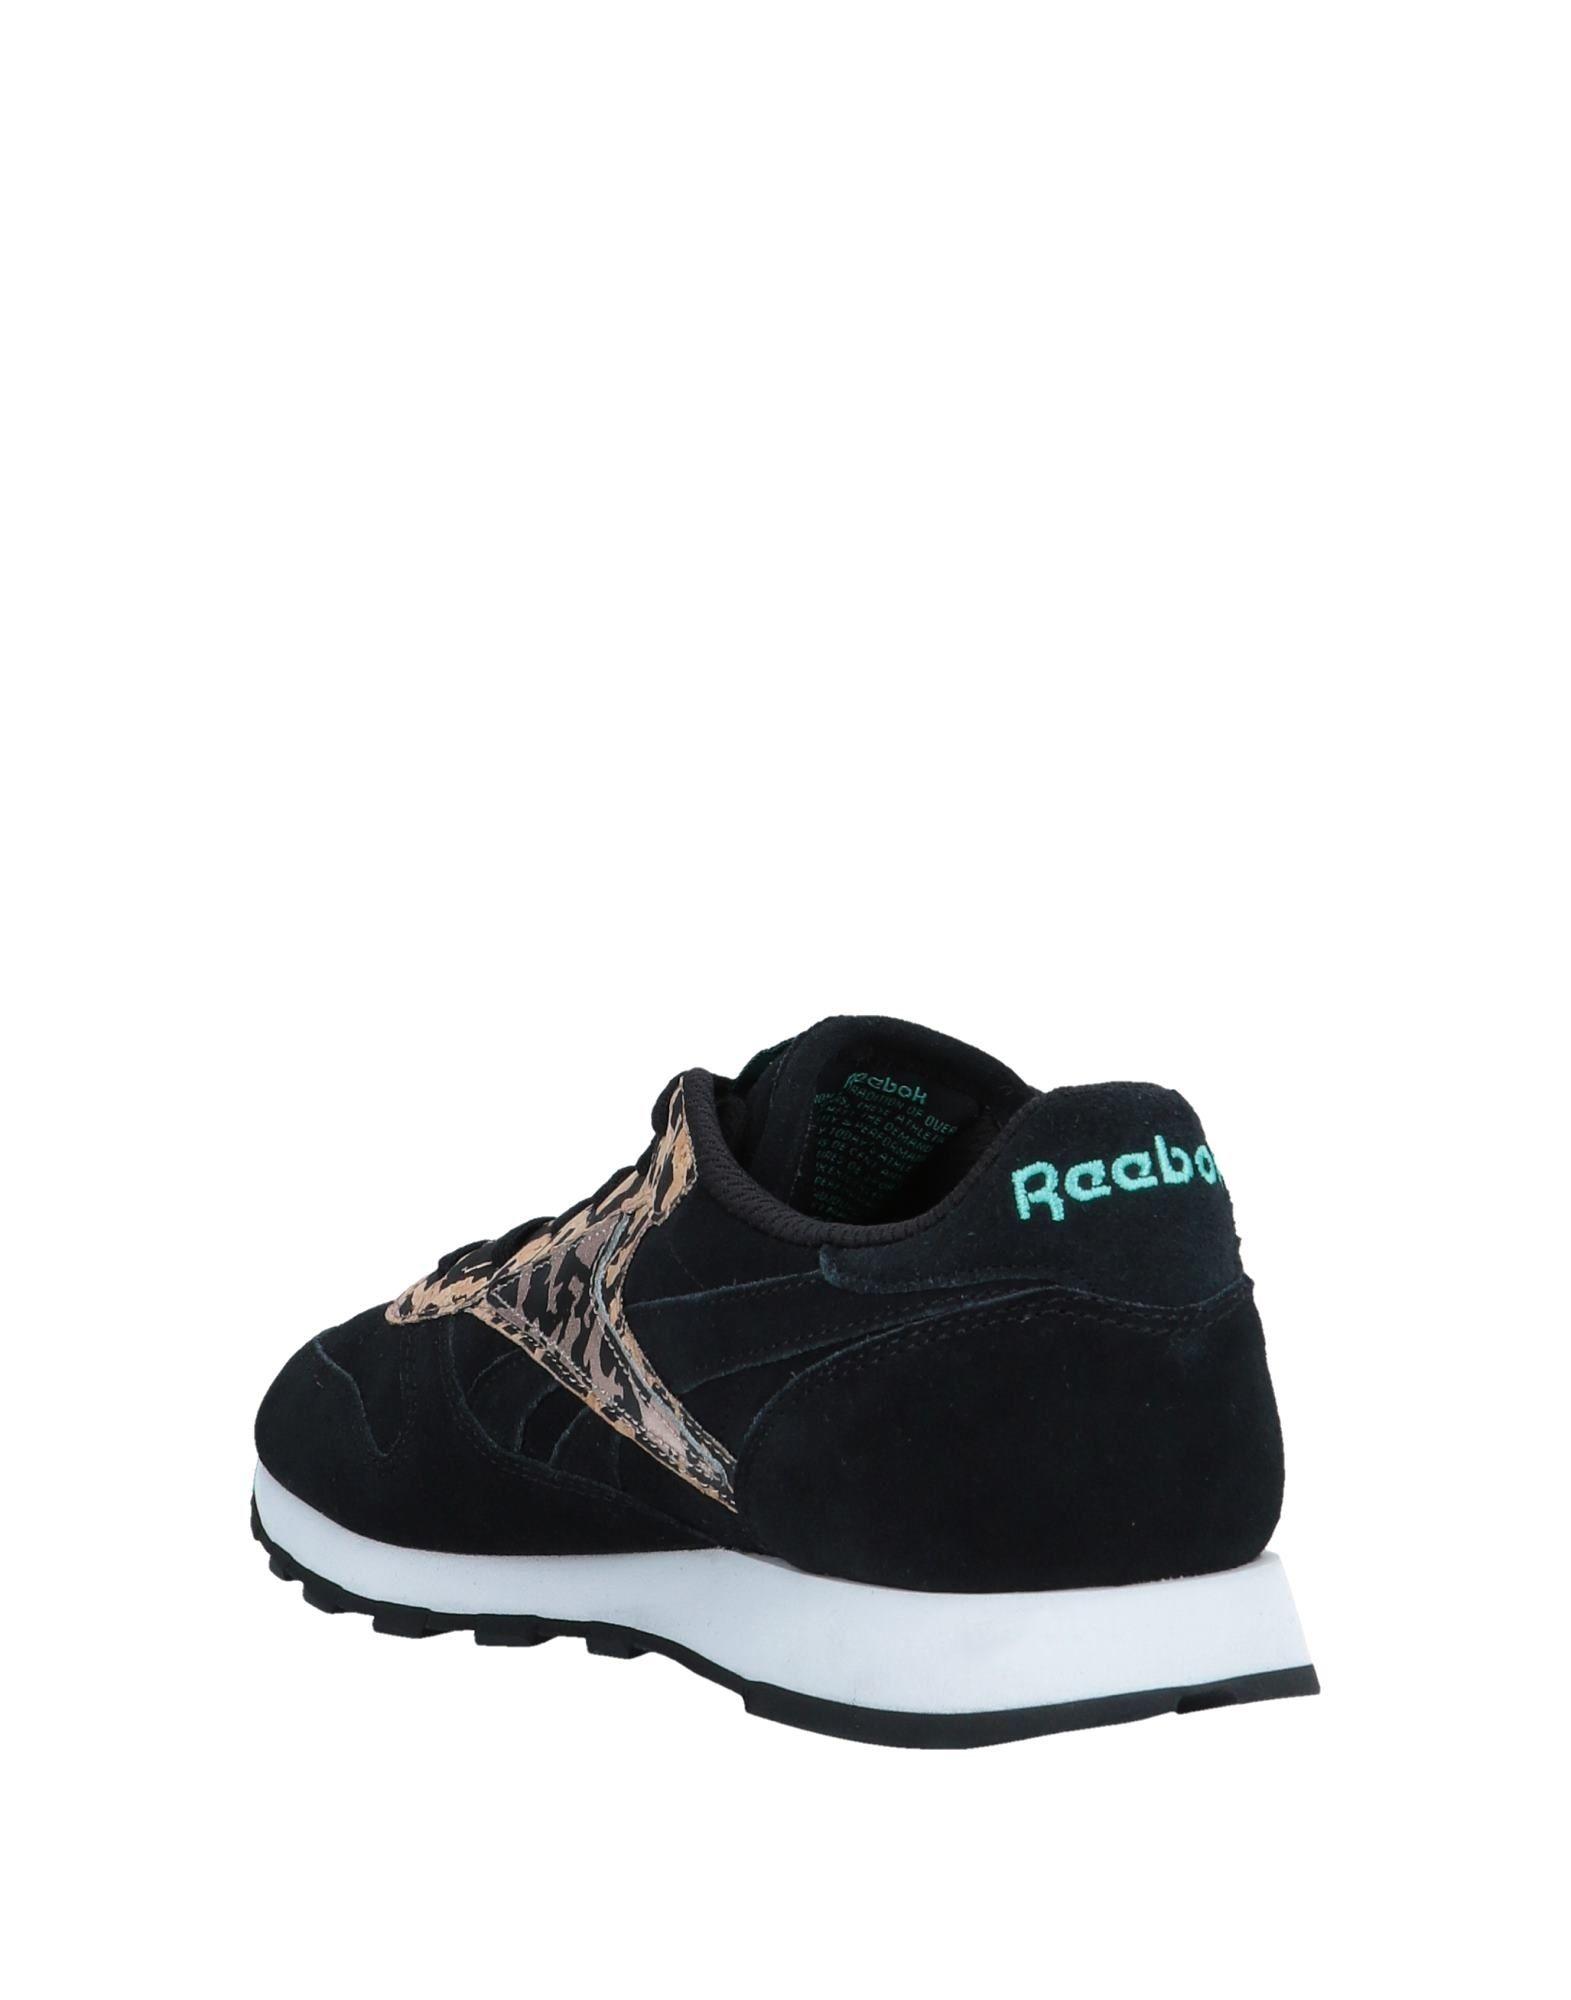 Reebok Sneakers - Women Reebok Sneakers Sneakers Sneakers online on  United Kingdom - 11570675PX 973108